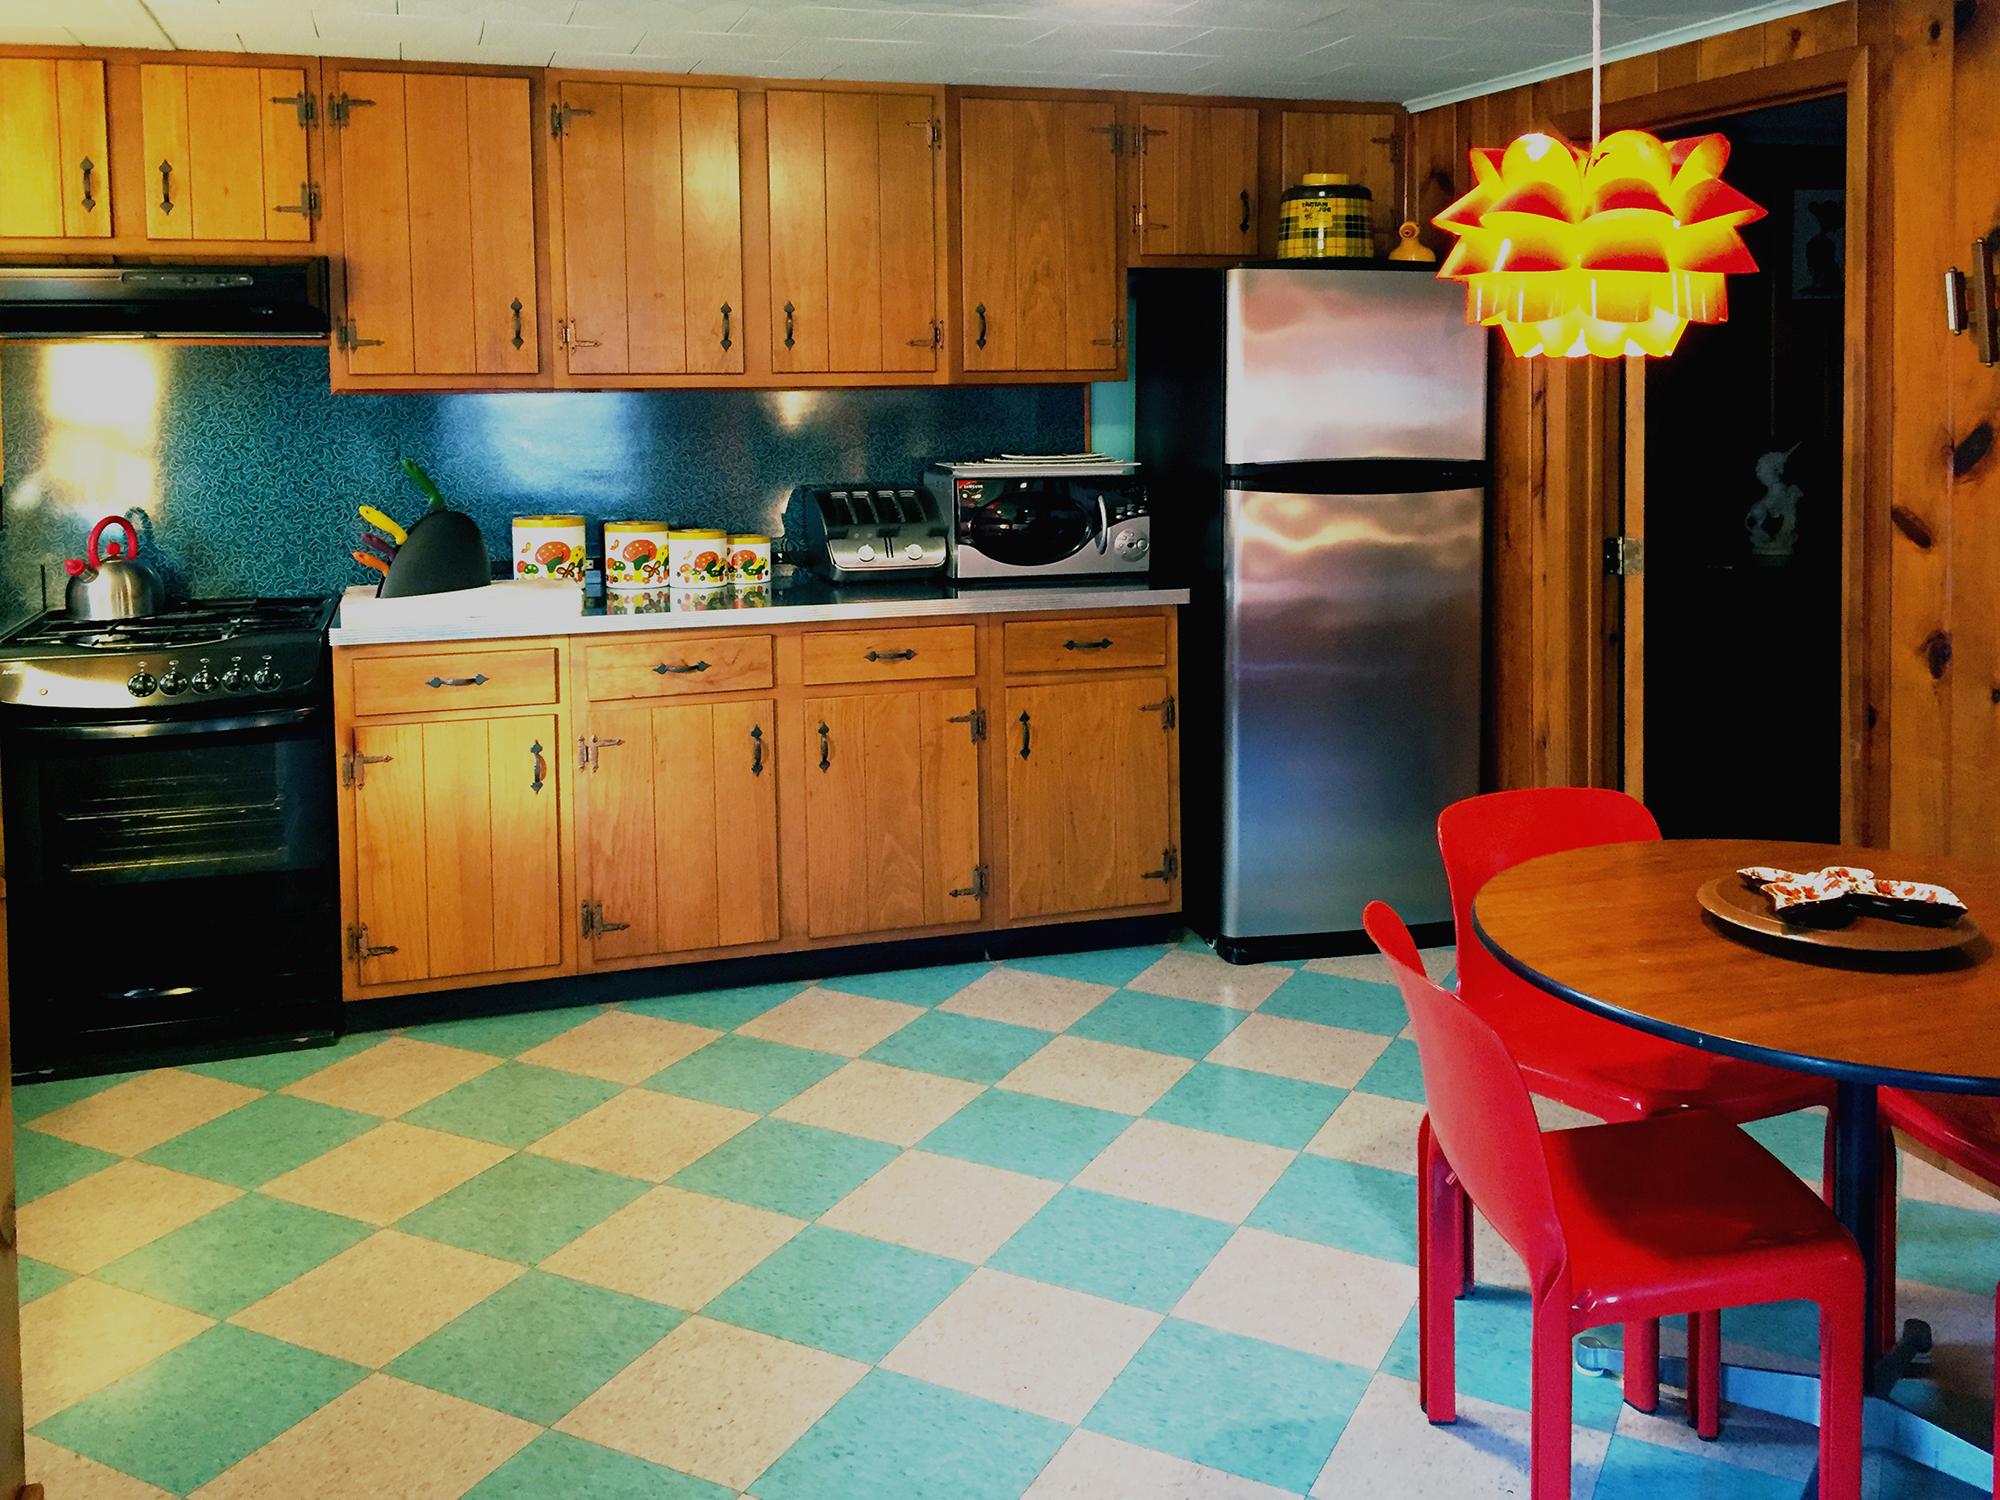 suite1_kitchen4%20copy2.jpg